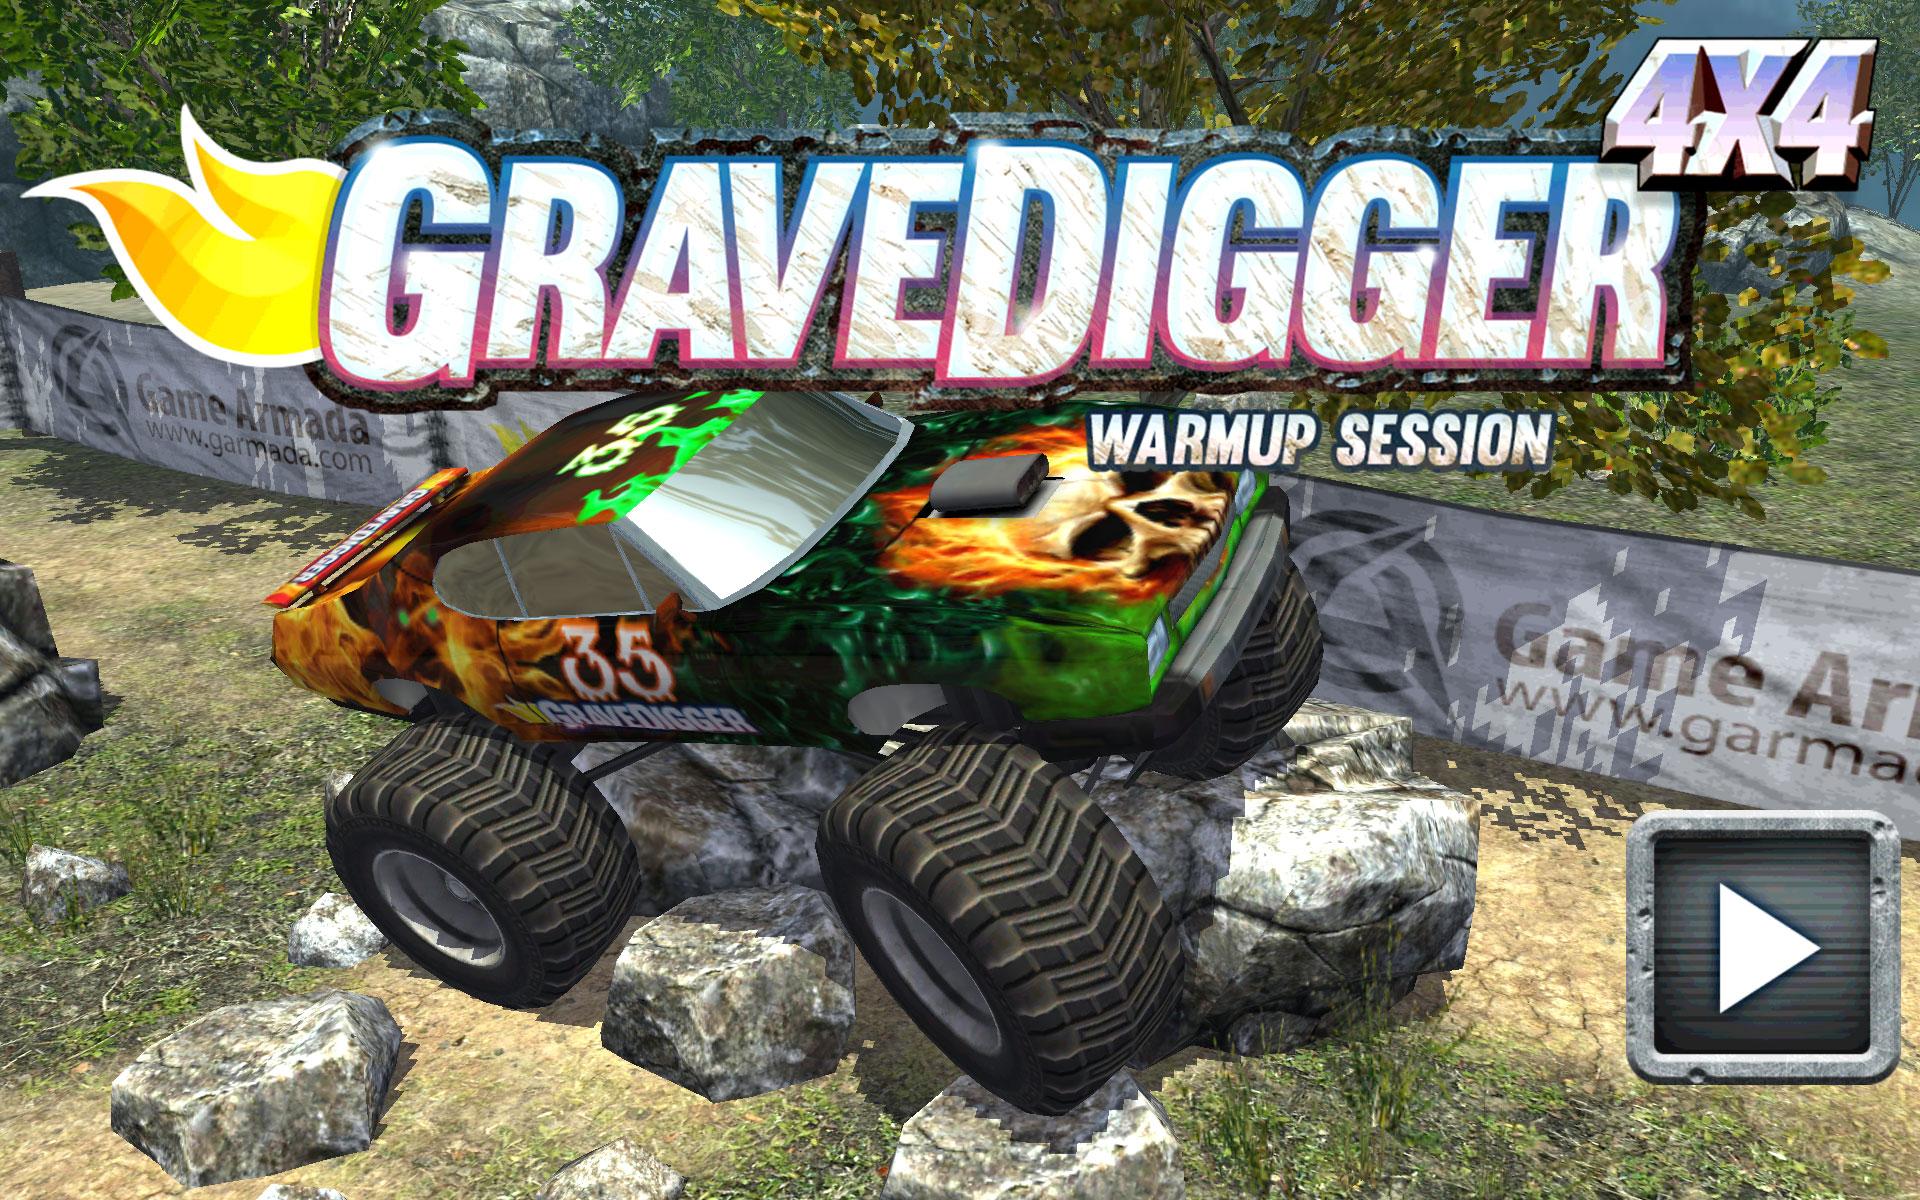 GraveDigger 4x4